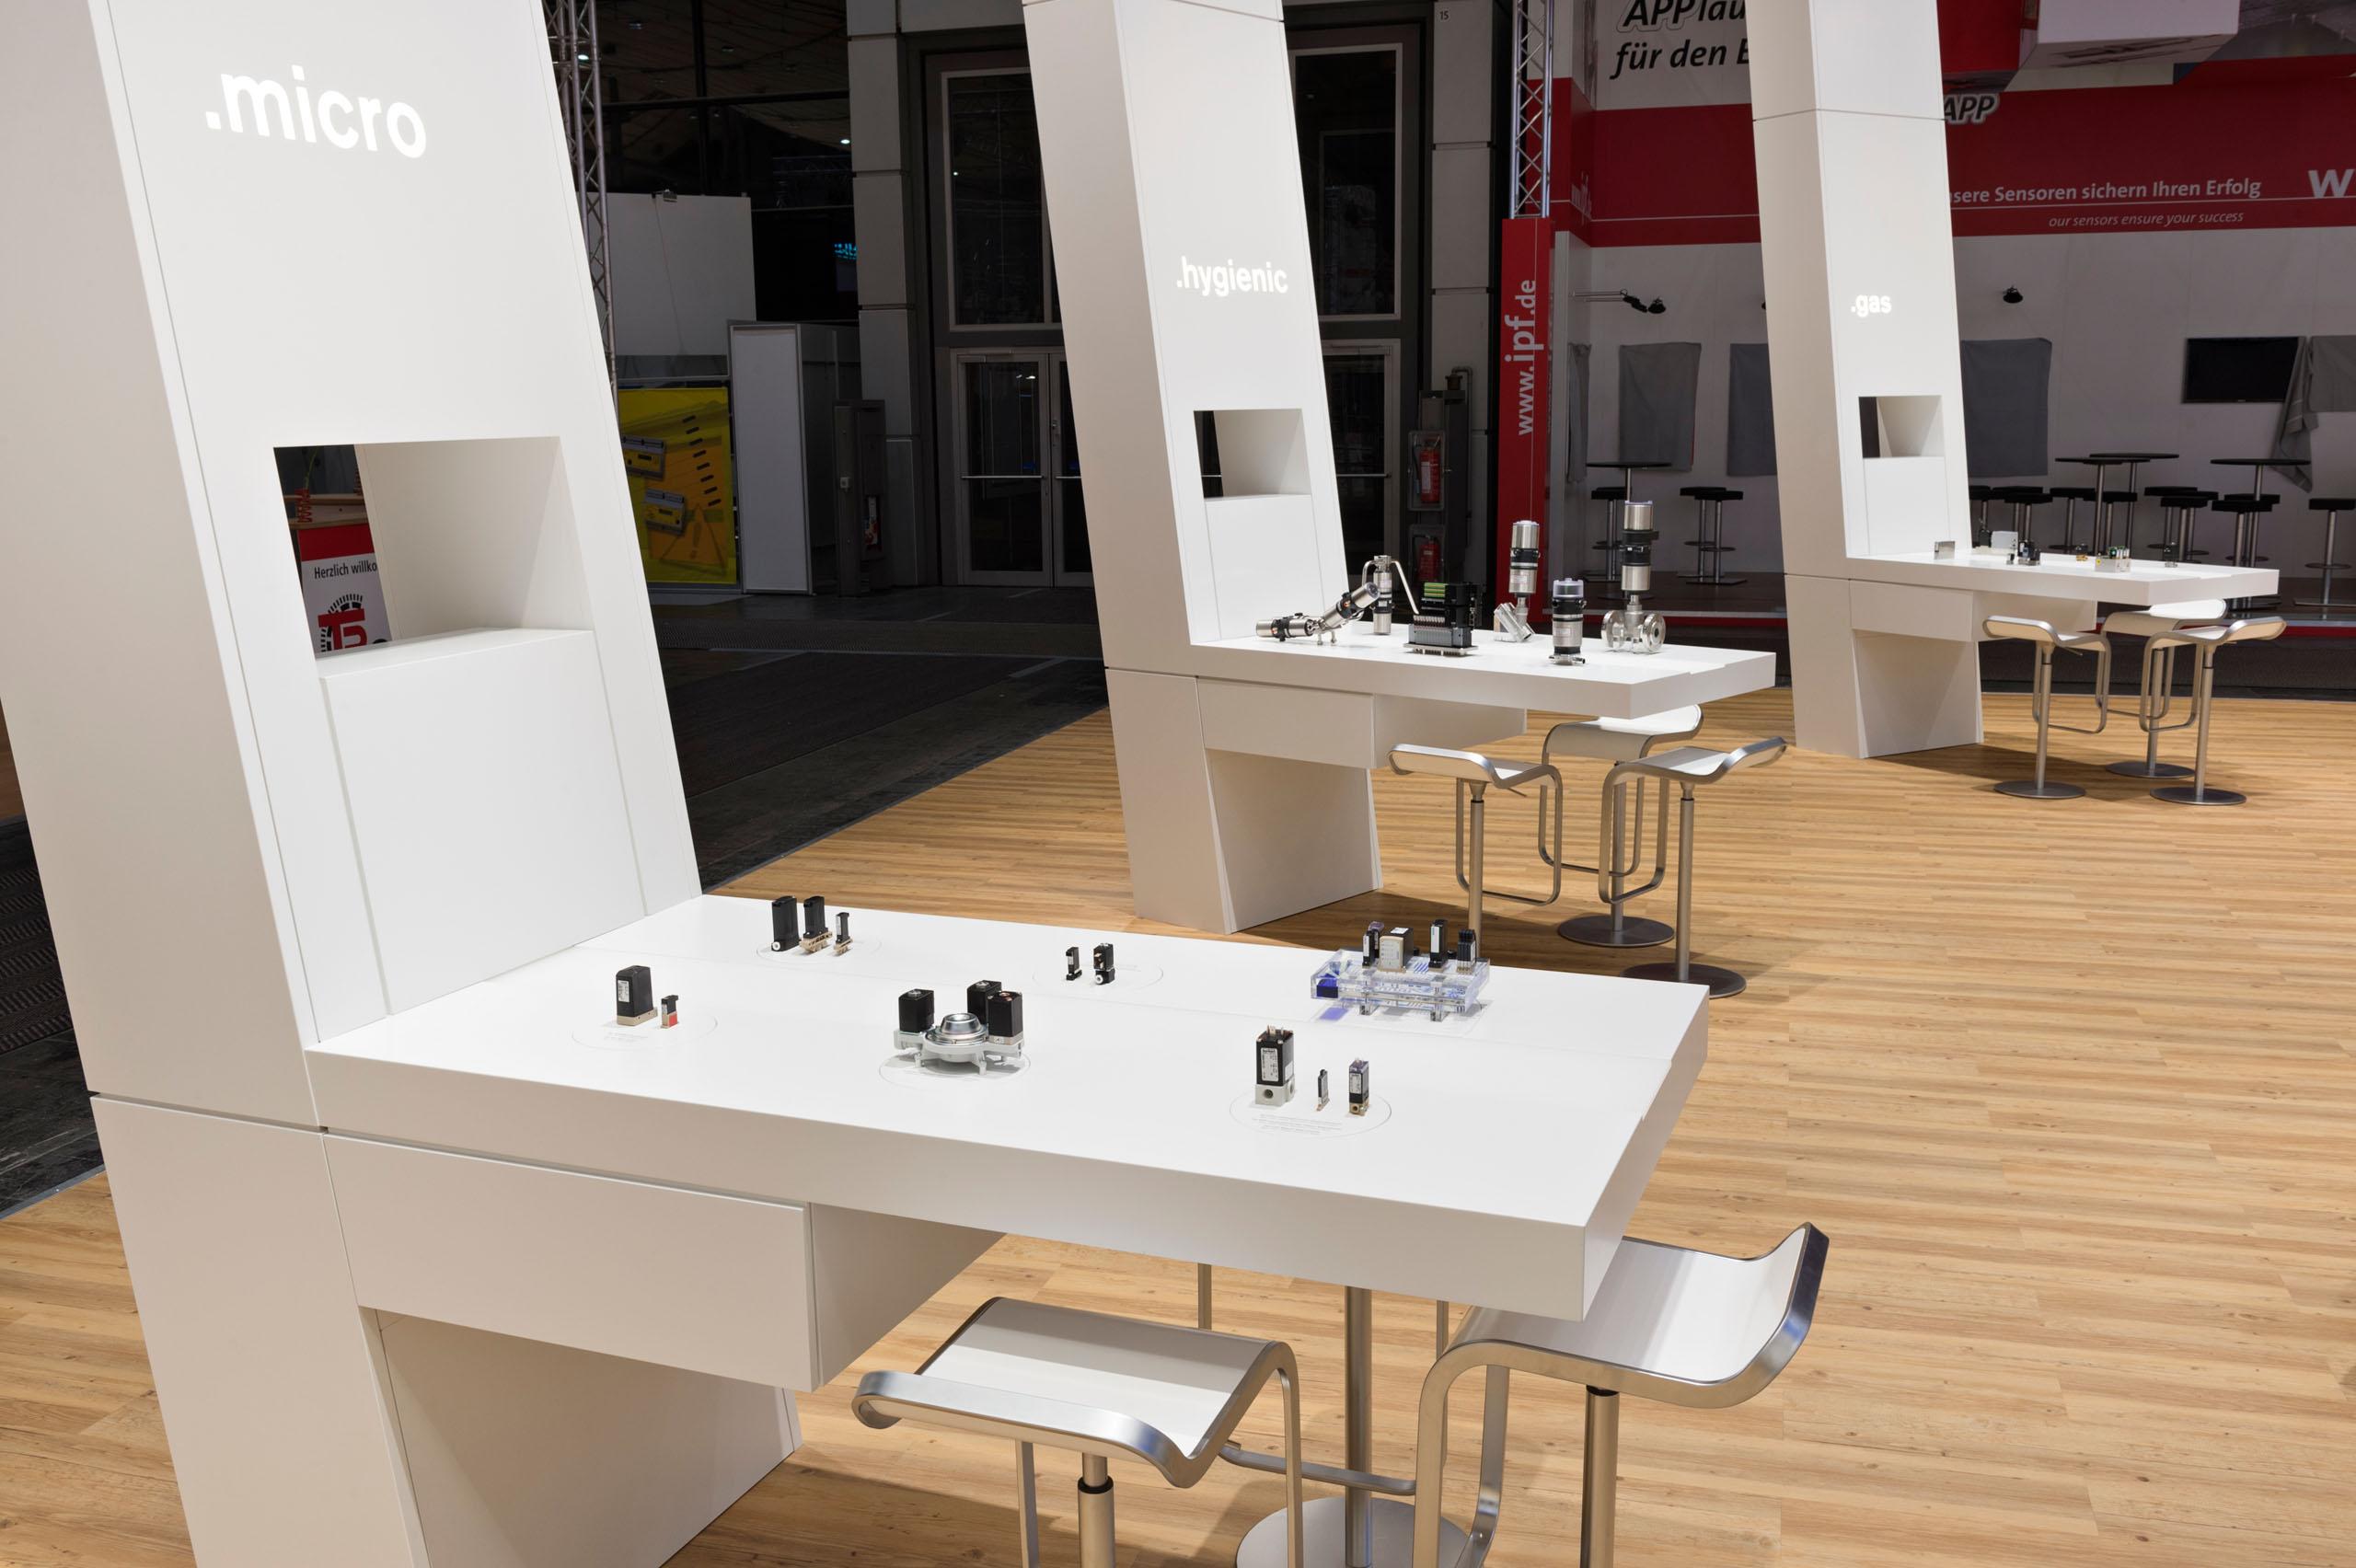 ulf bueschleb b rkert gmbh co kg hannover messe international triad berlin. Black Bedroom Furniture Sets. Home Design Ideas